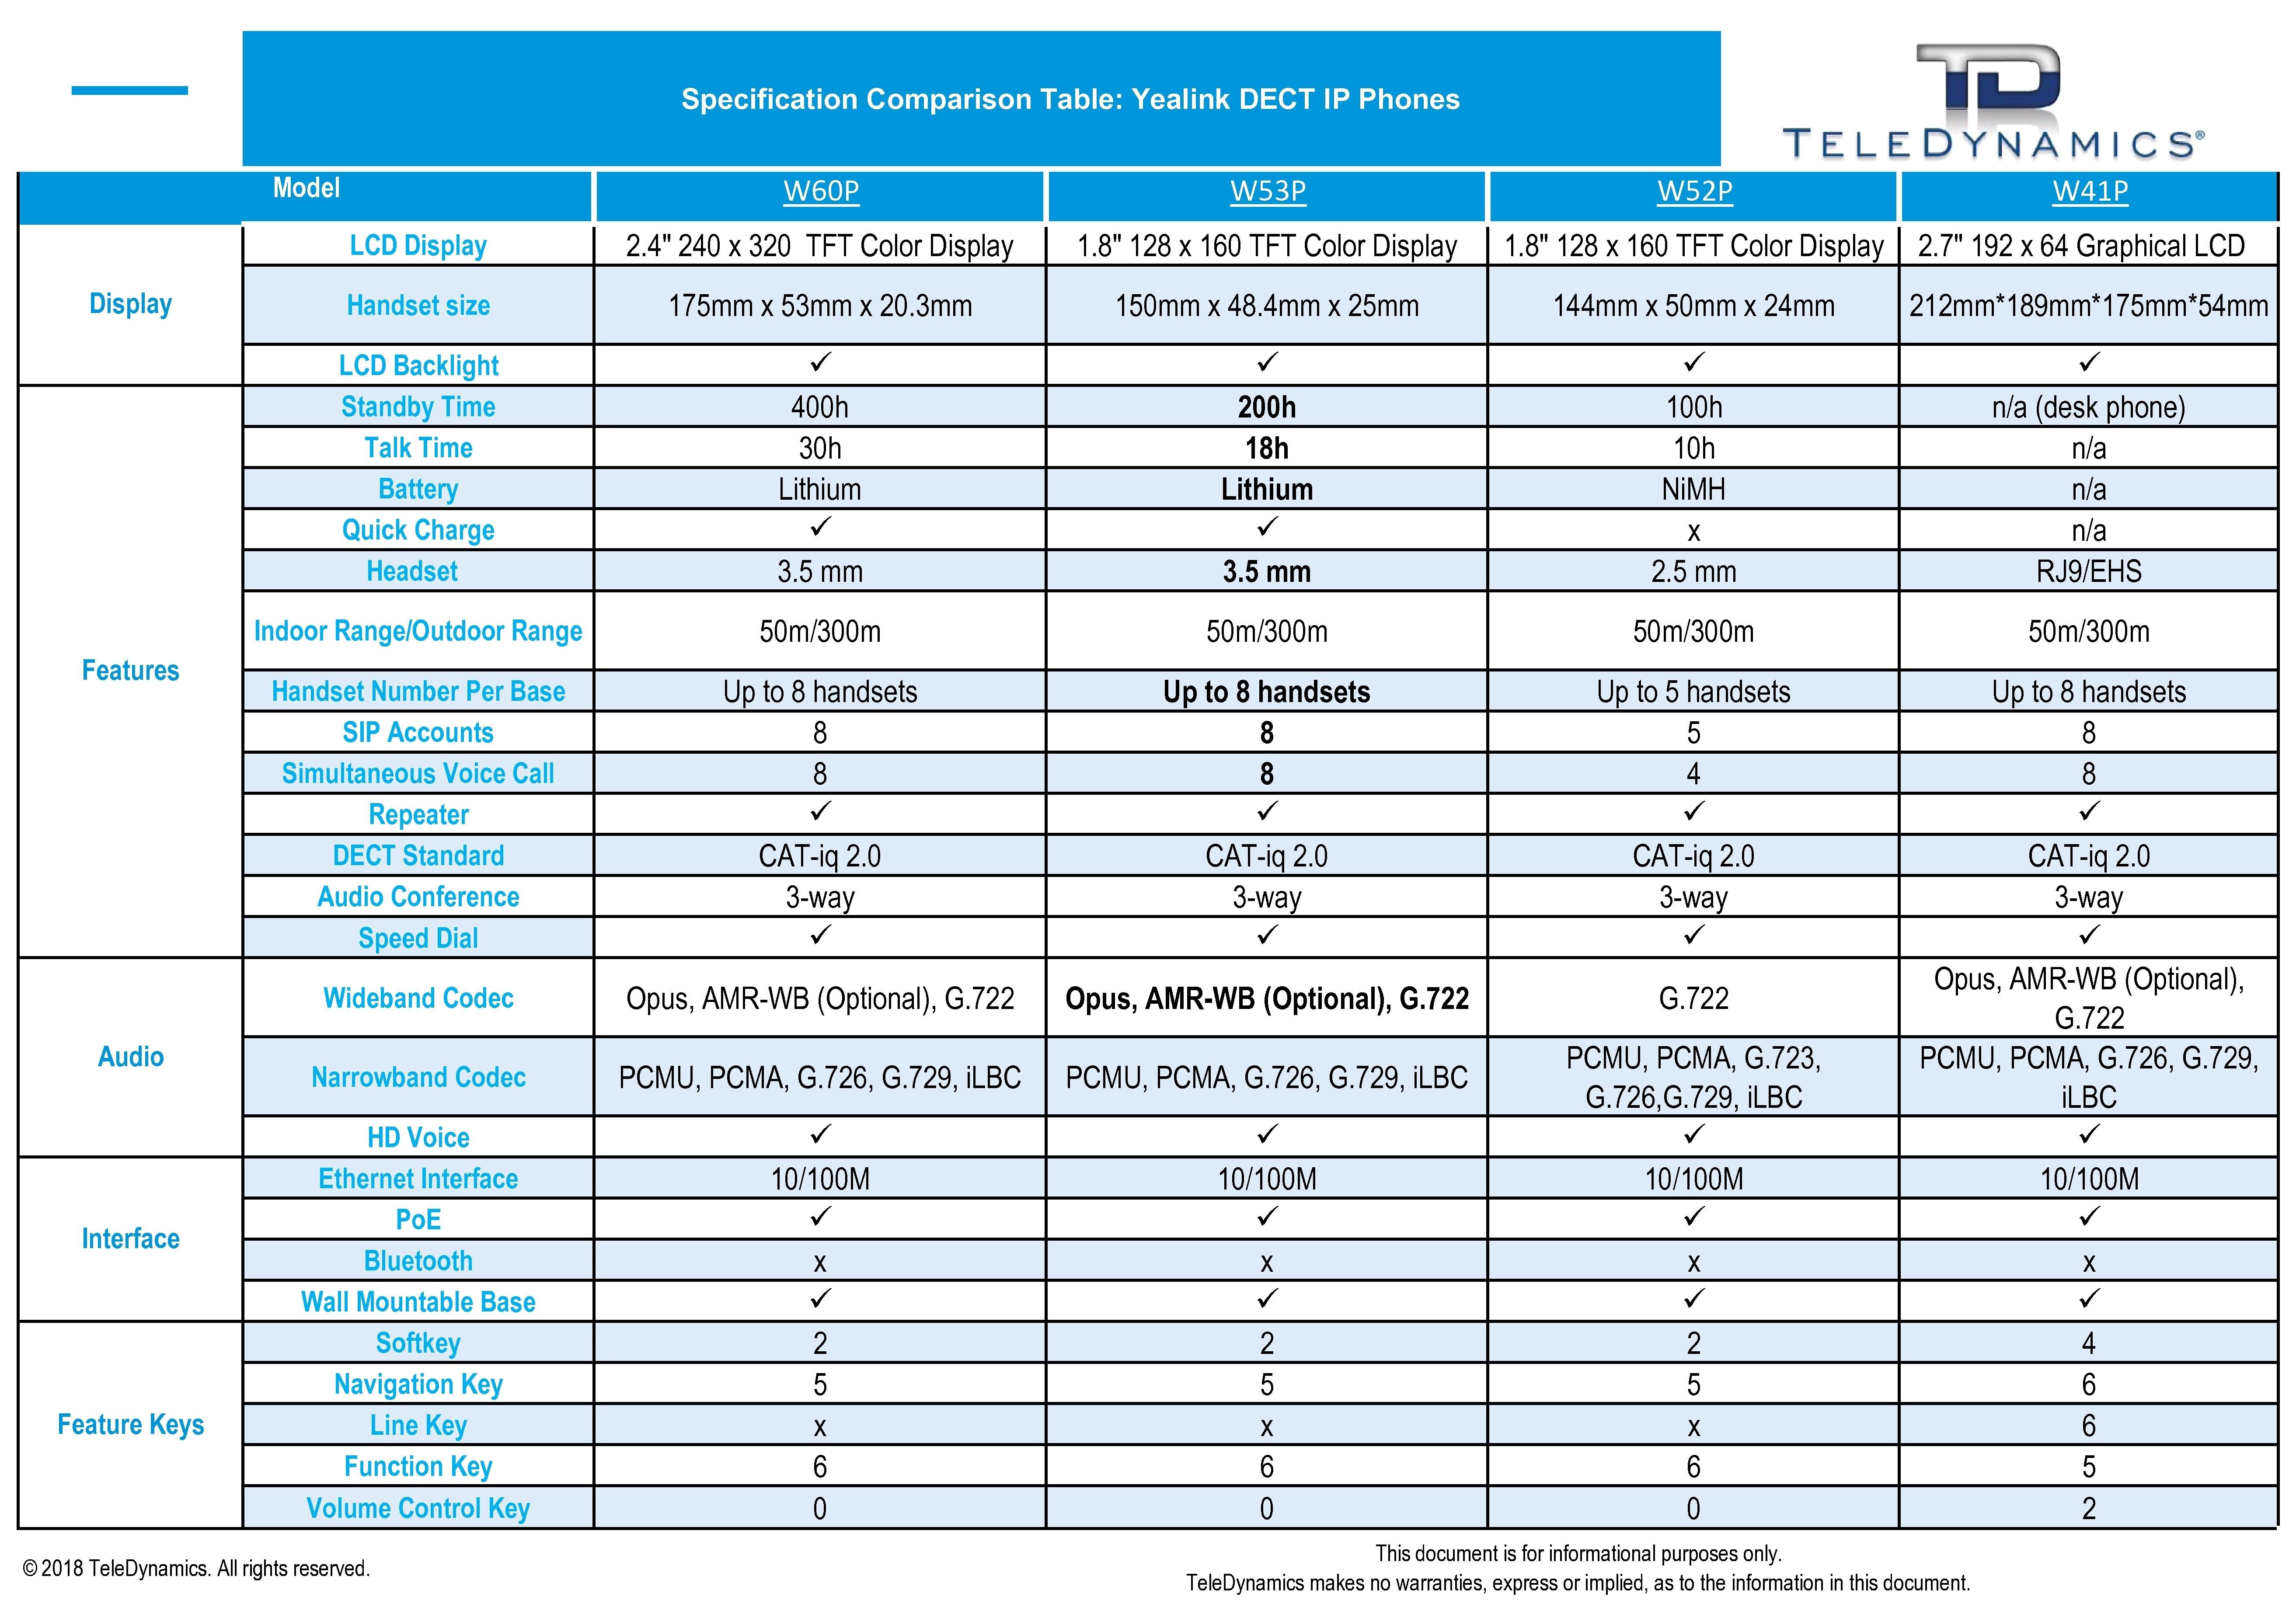 Yealink DECT Phone Spec Comparison Table